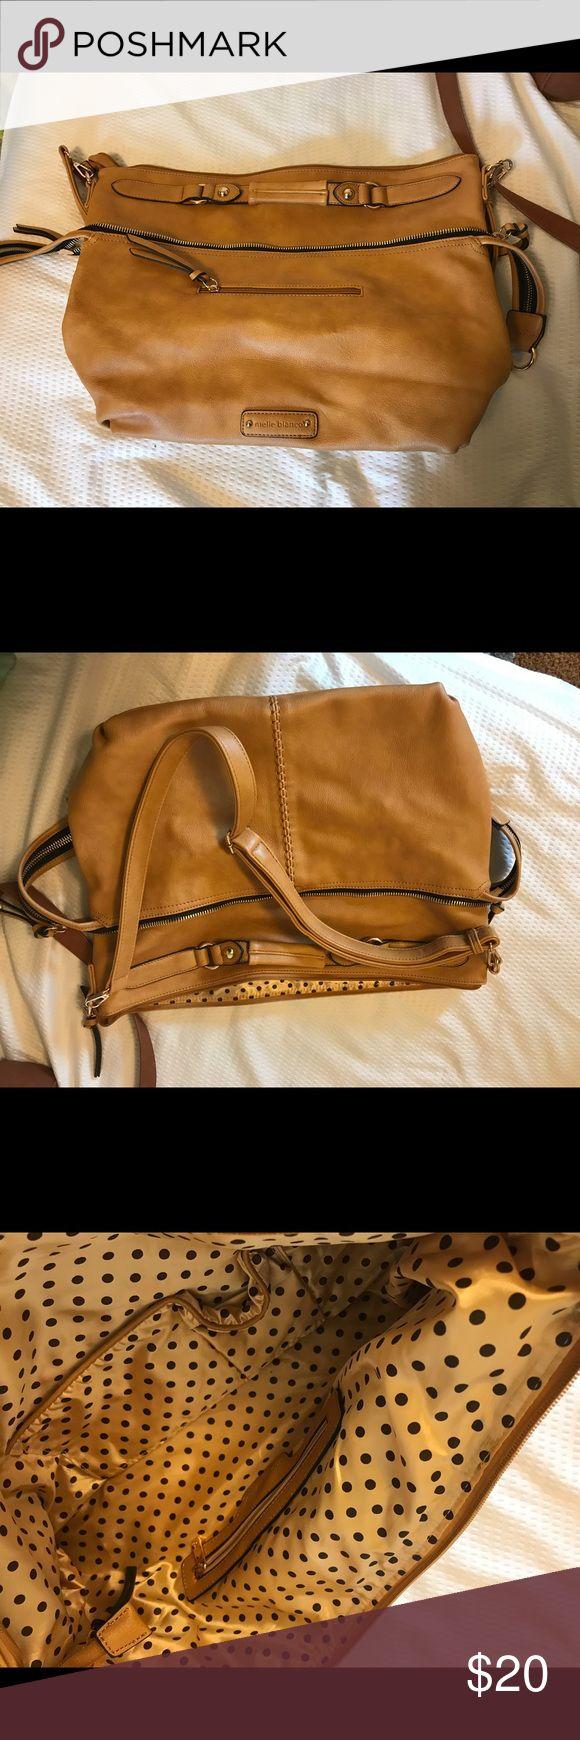 Large vegan melie bianco shoulder bag Brand new shoulder bag, no rips or stains vegan leather, used a MacBook Air so you can get a size comparison Melie Bianco Bags Shoulder Bags